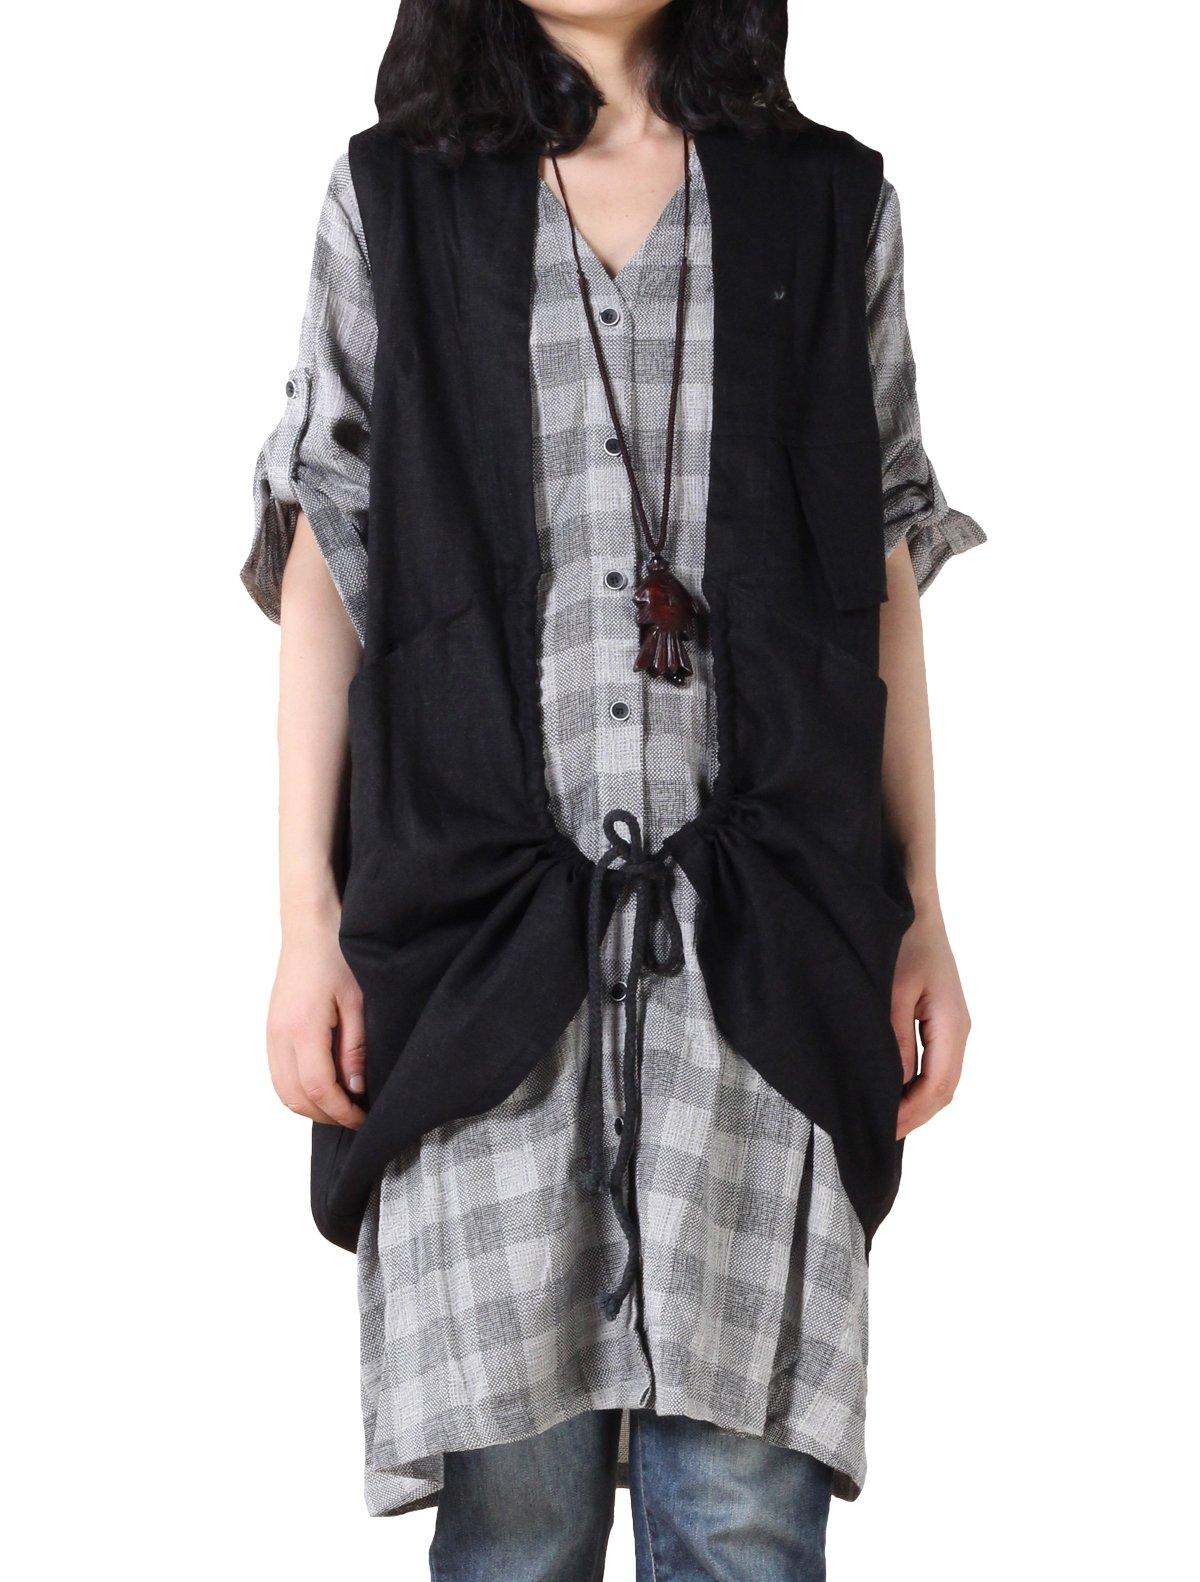 Mordenmiss Women's Sleeveless Vest Casual Blouse Waistcoat Black